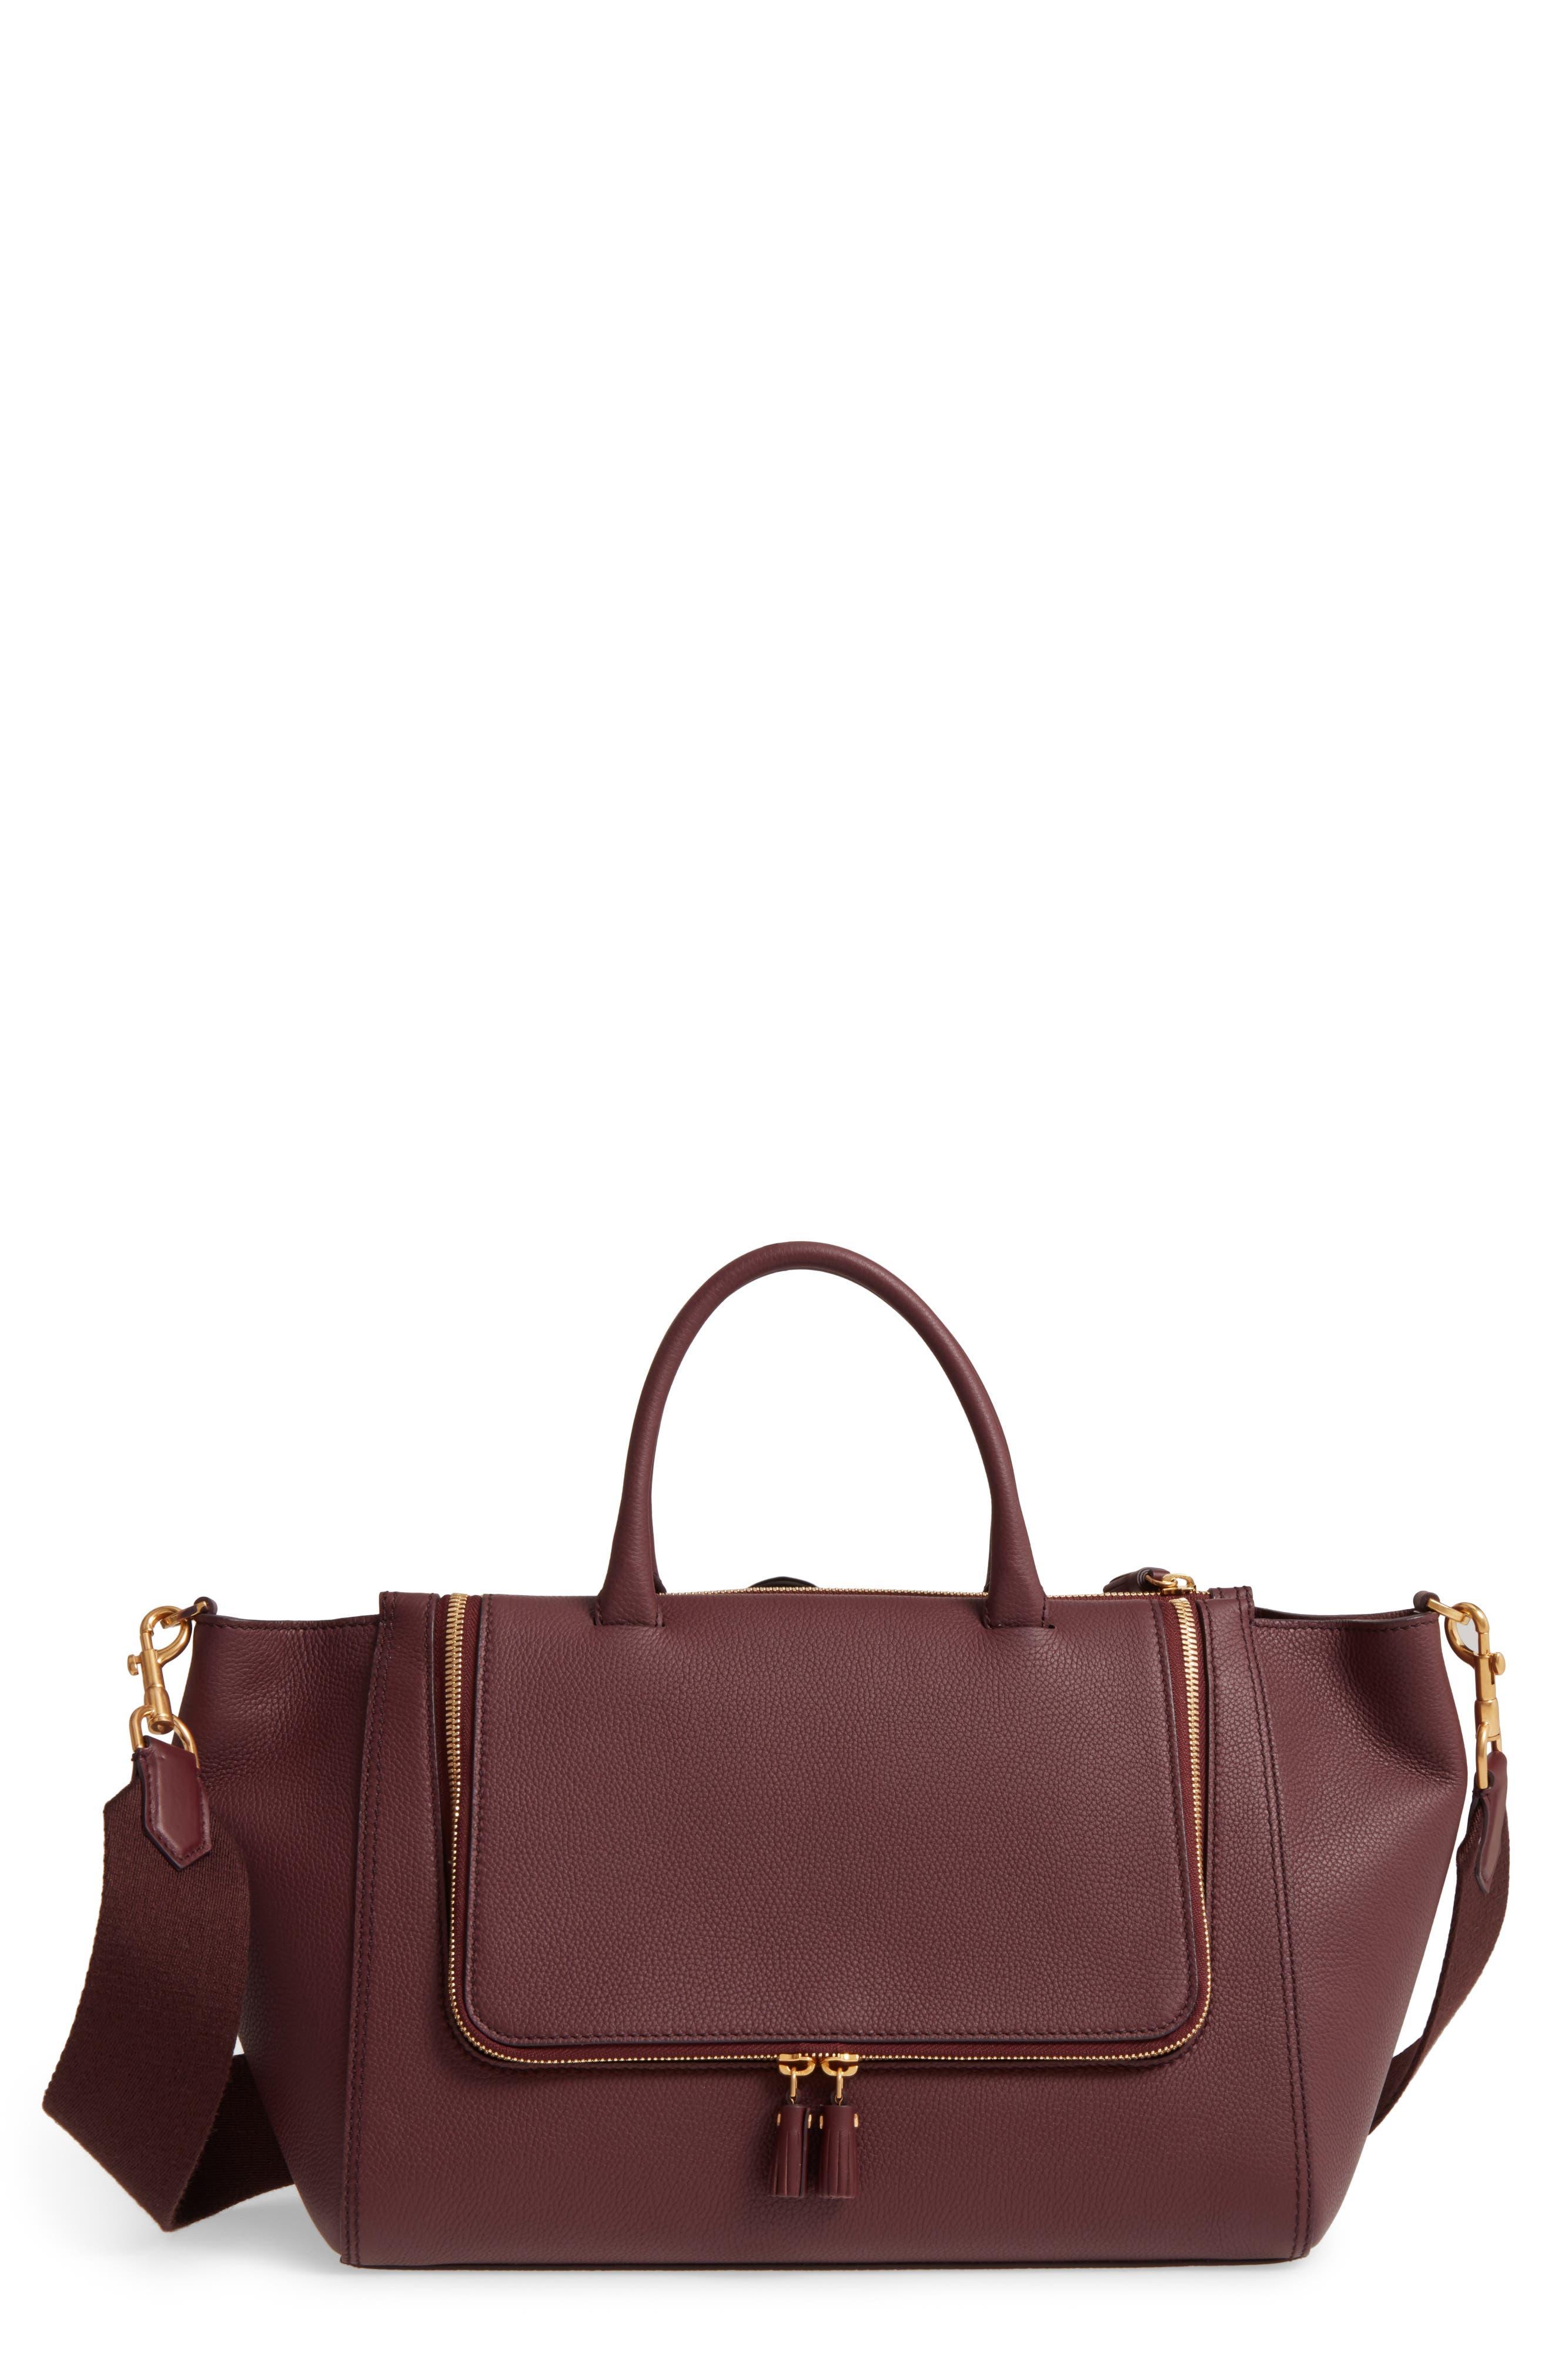 Vere Leather Tote,                         Main,                         color, Claret